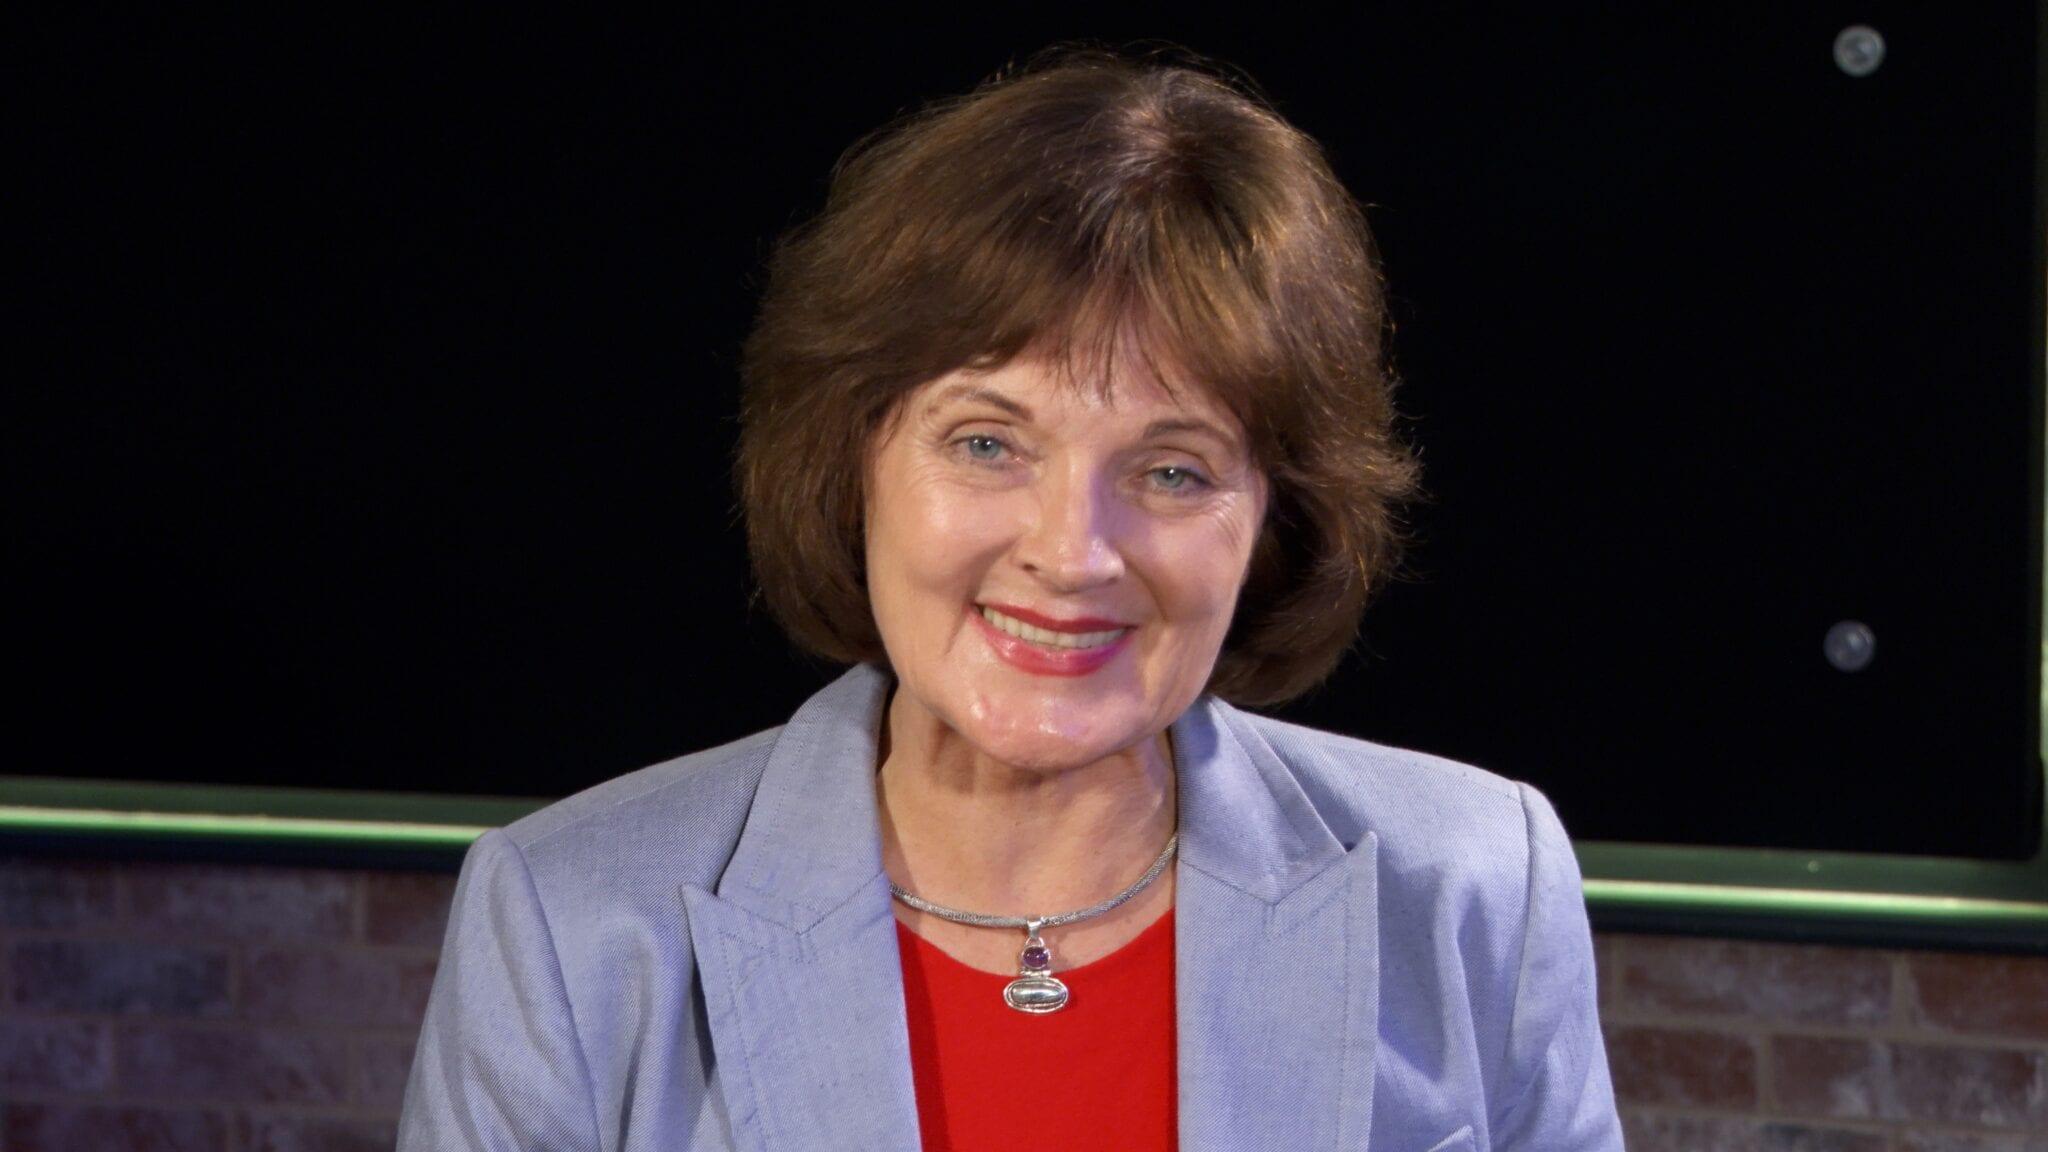 Mariette Richardson